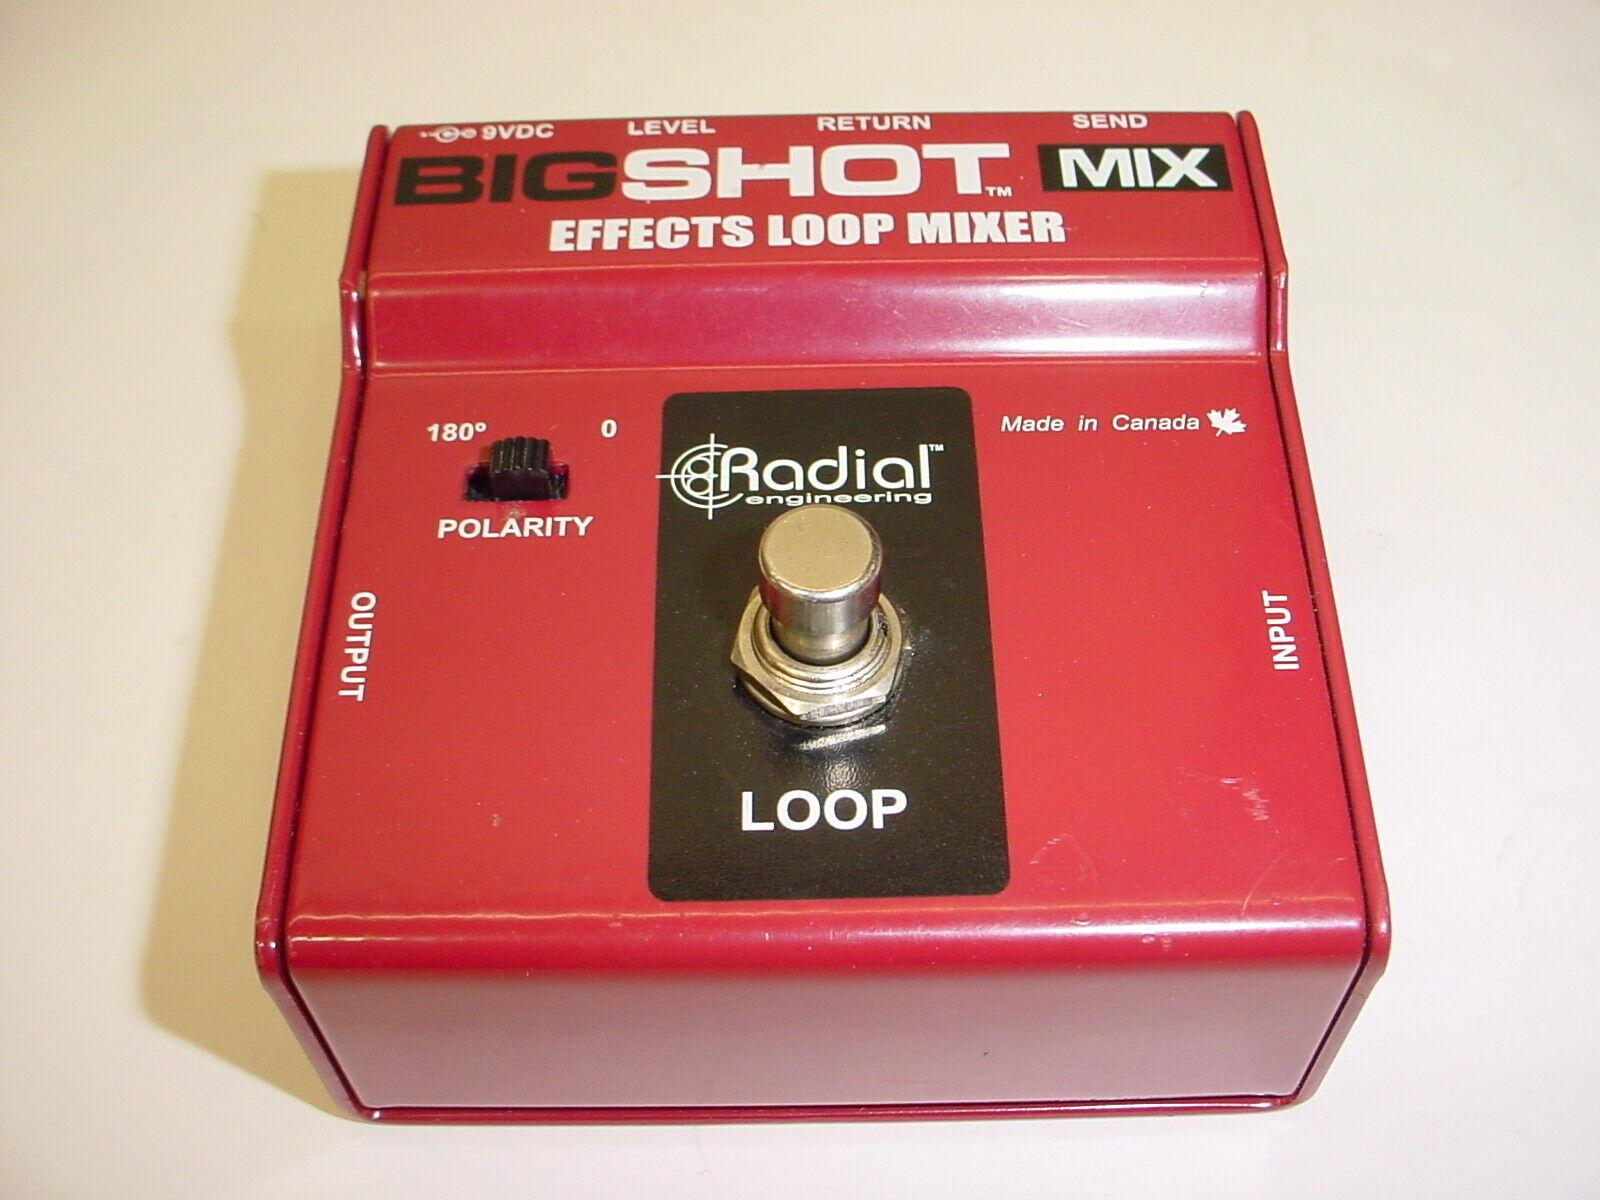 Radial BigShot MIX Effects Loop Mixer Guitar Effect Pedal